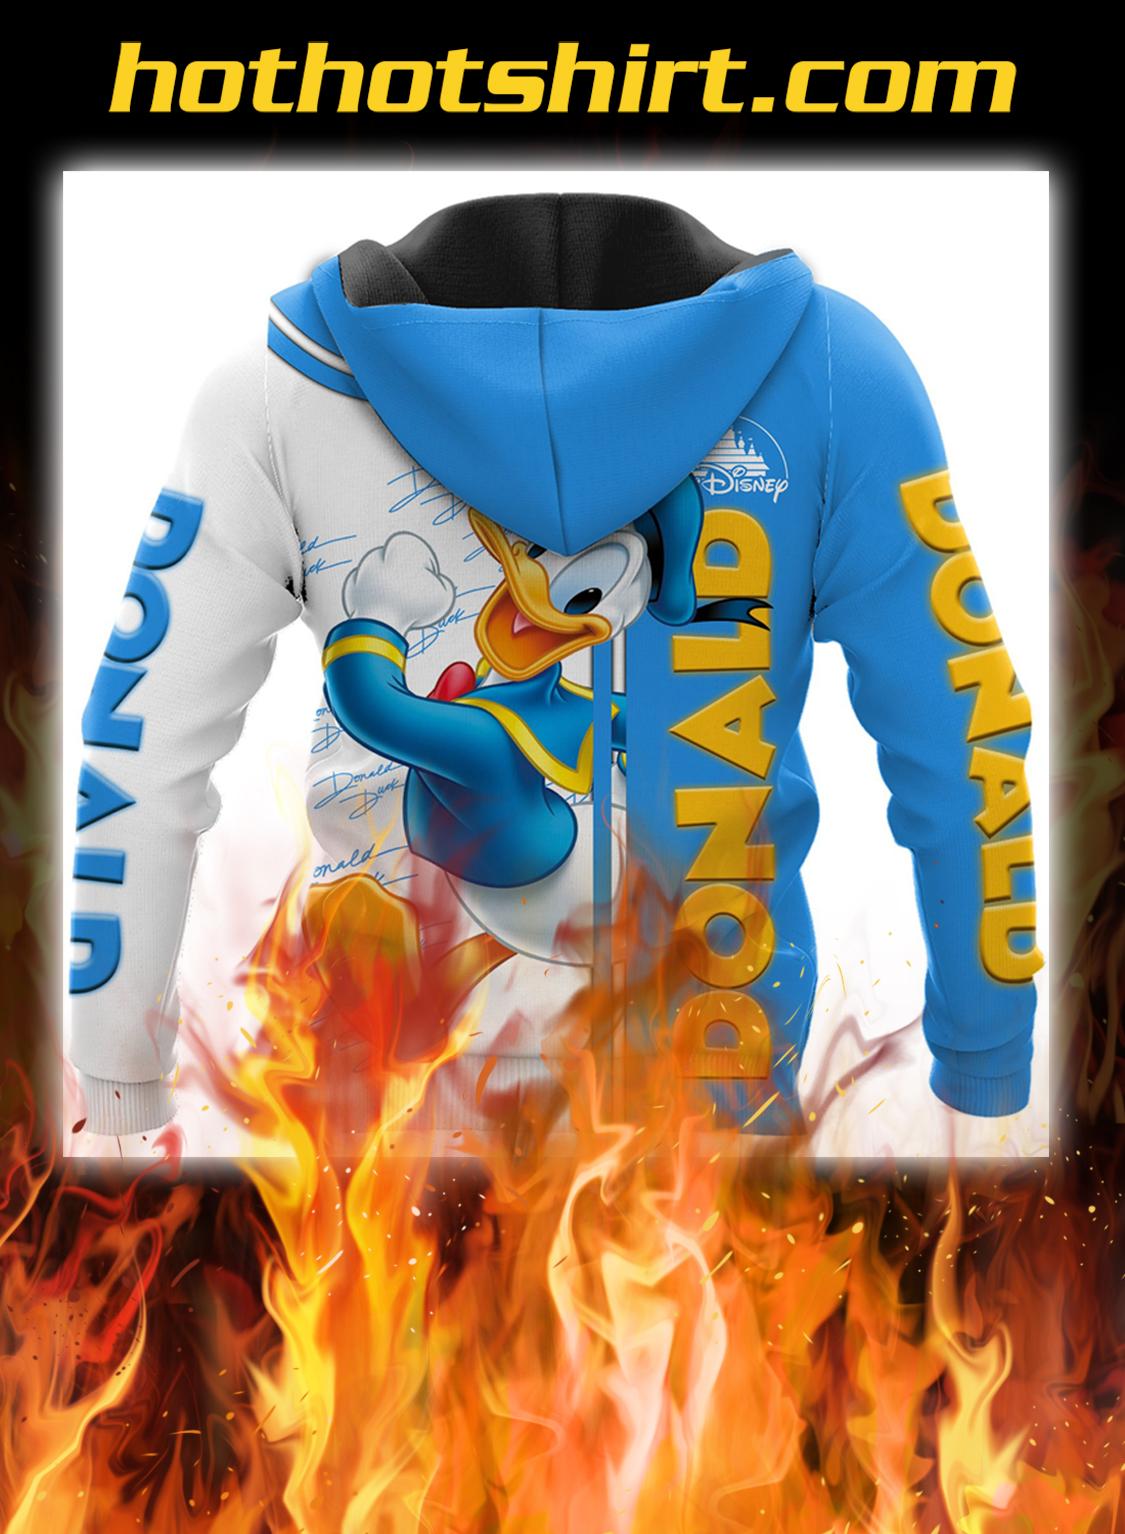 Donald duck disney 3d hoodie- pic 2